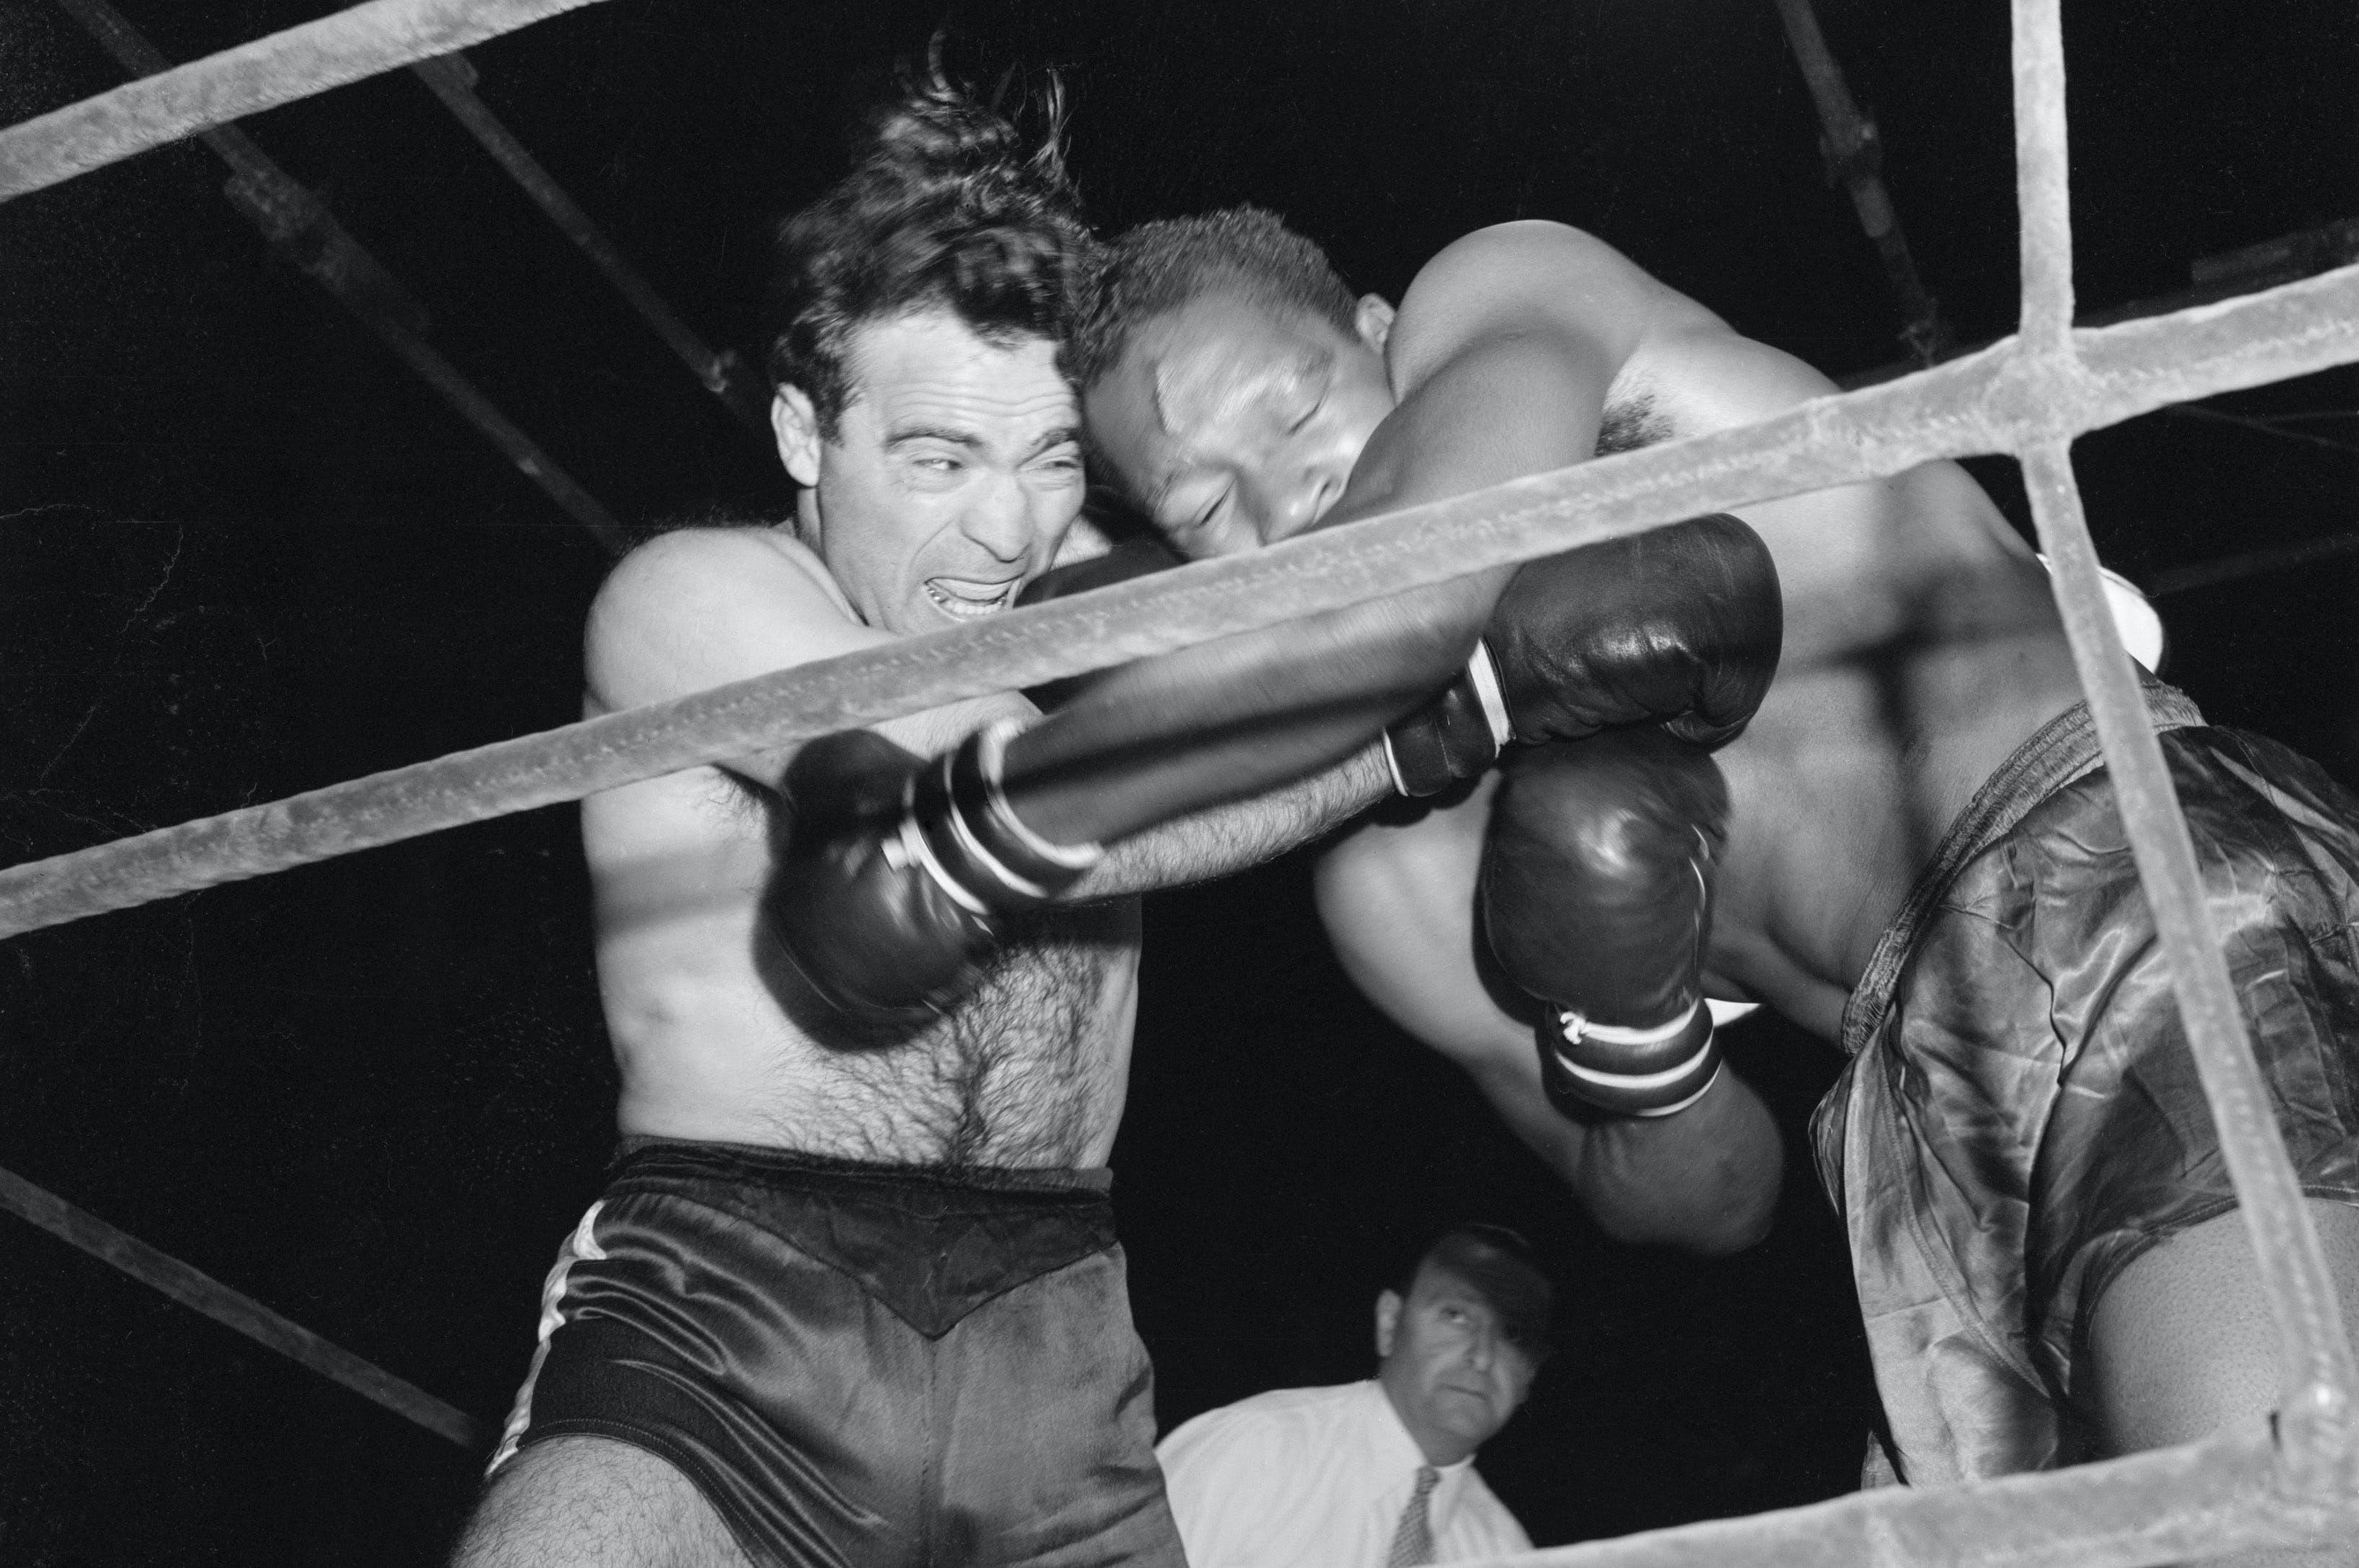 7 juillet 1946 - Cerdan vs Williams boxe à Roland-Garros